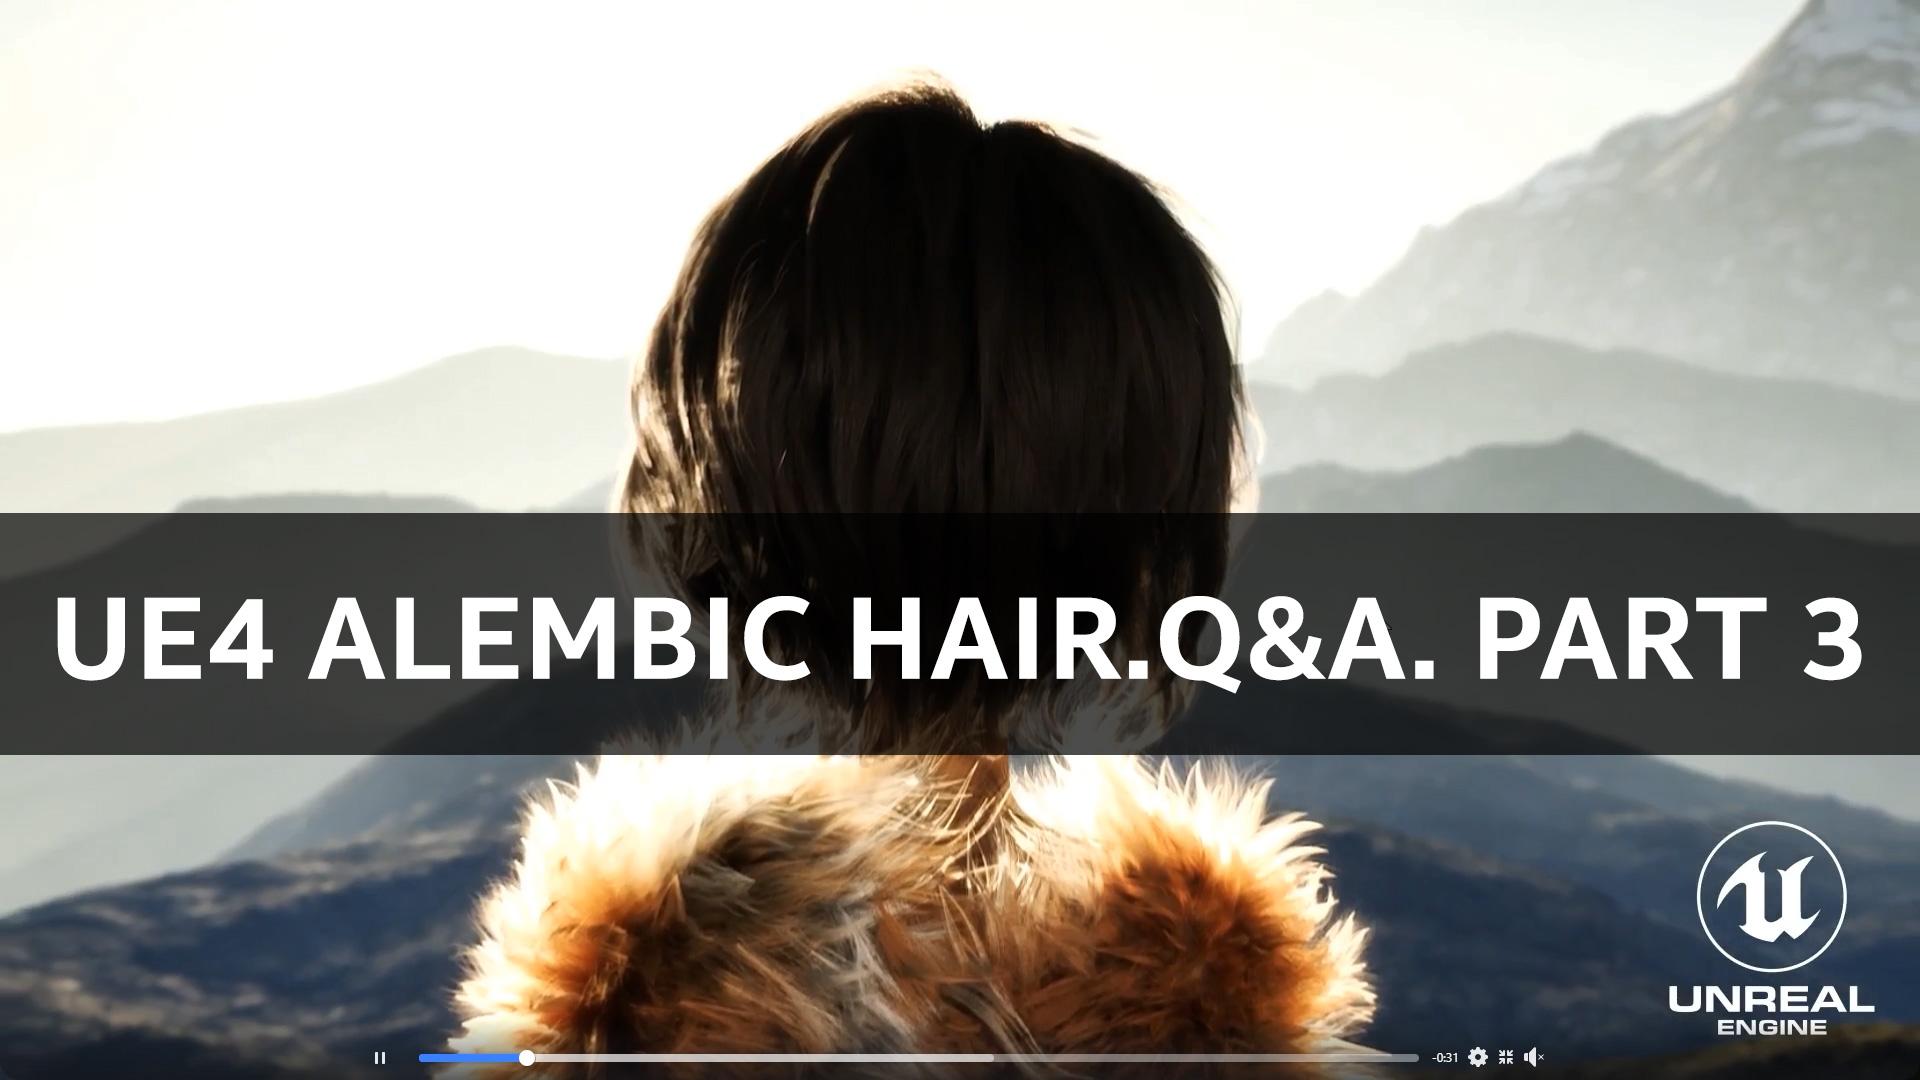 alembic_hair_part_3_youtube.jpg